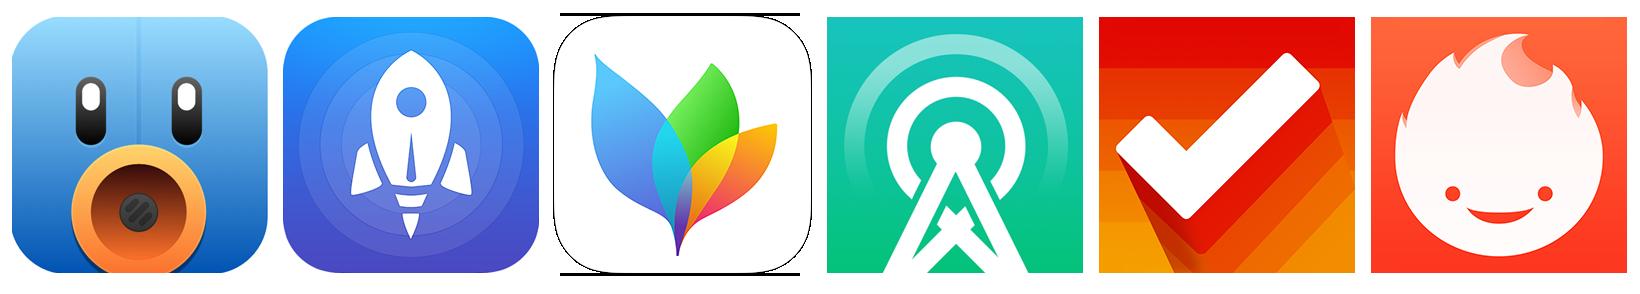 icon-design-ios7-icons2x